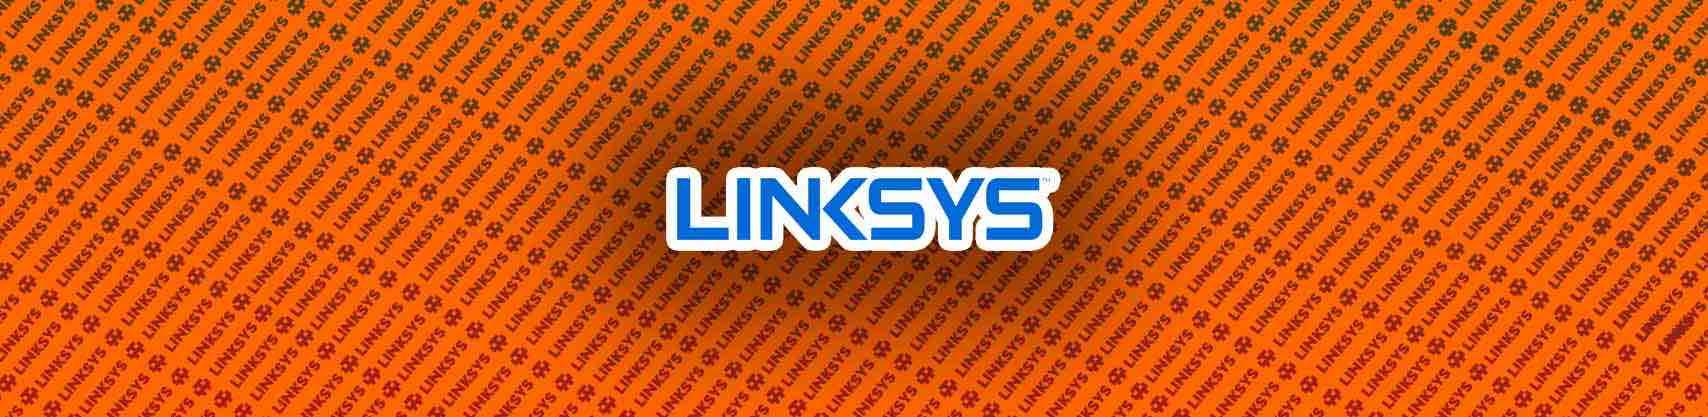 Linksys RE6400 Manual